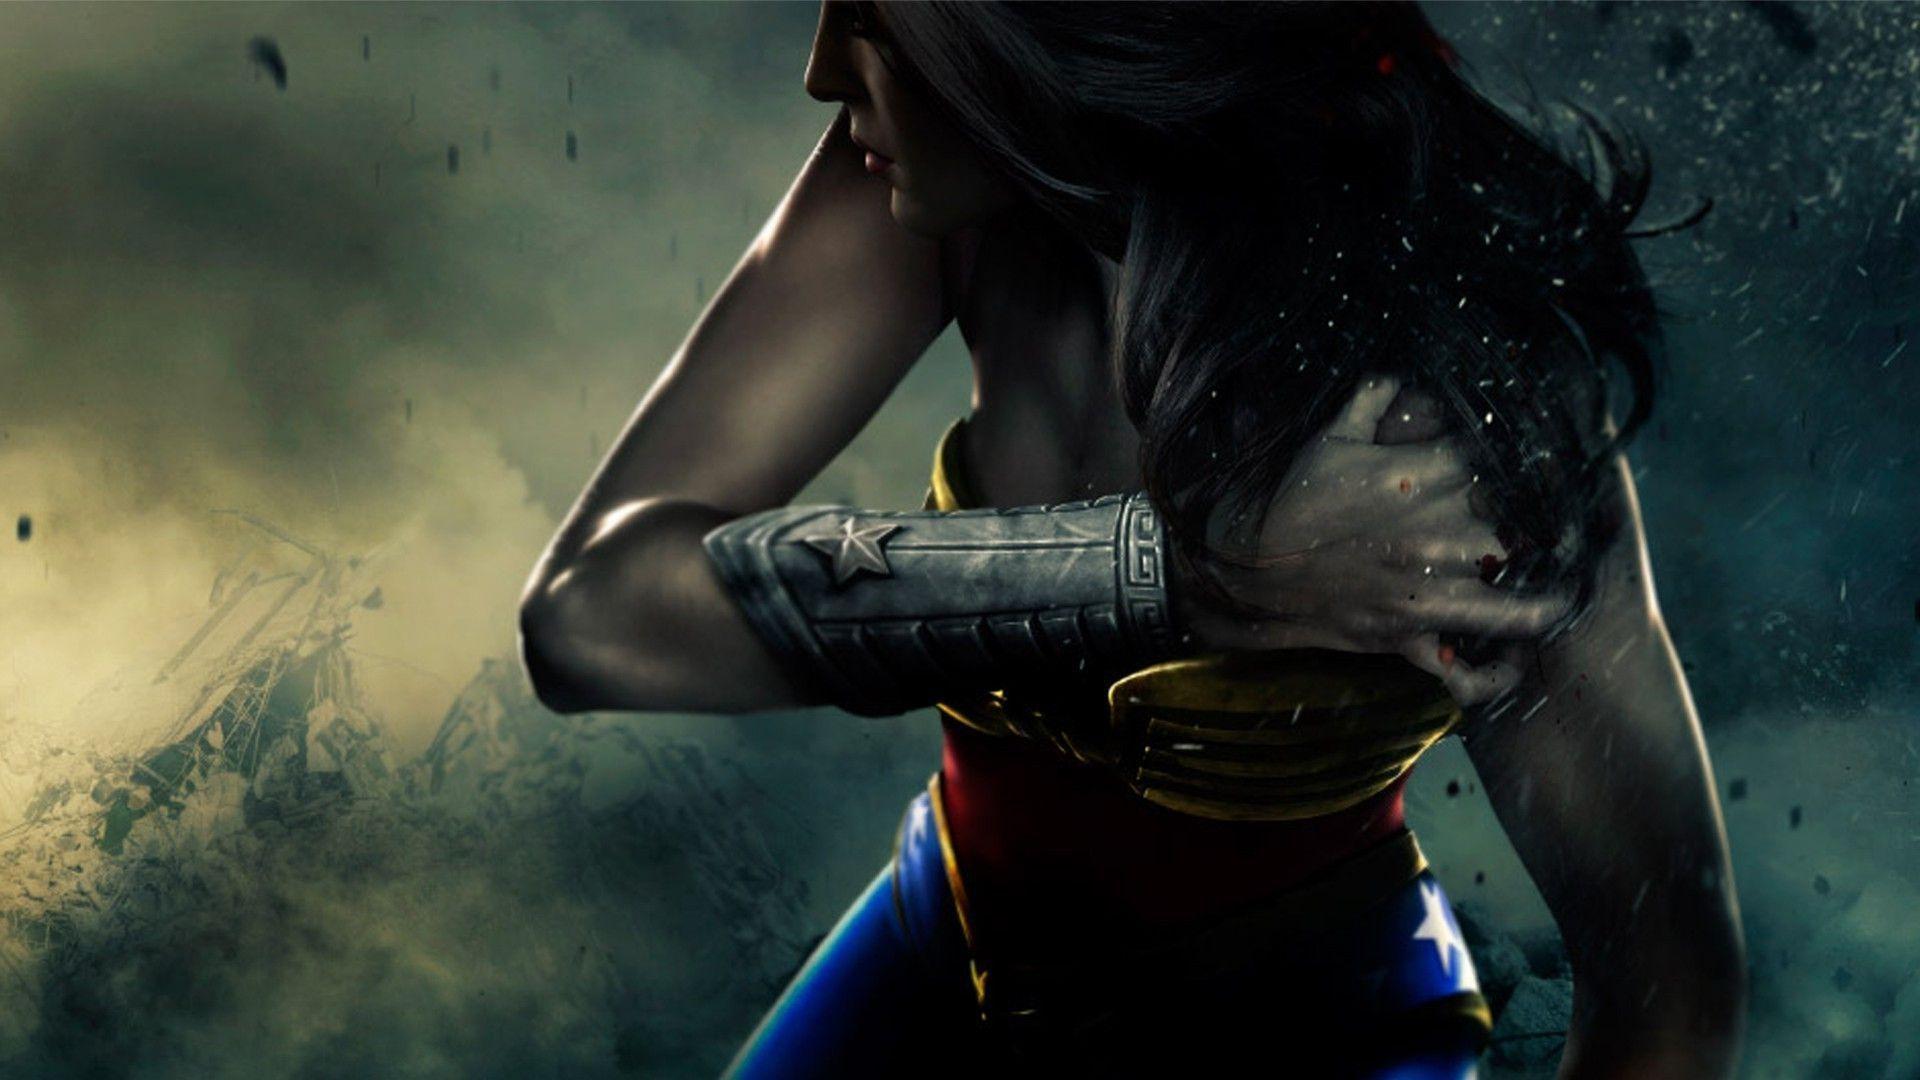 Wonder Woman Wallpapers Wallpaper Cave